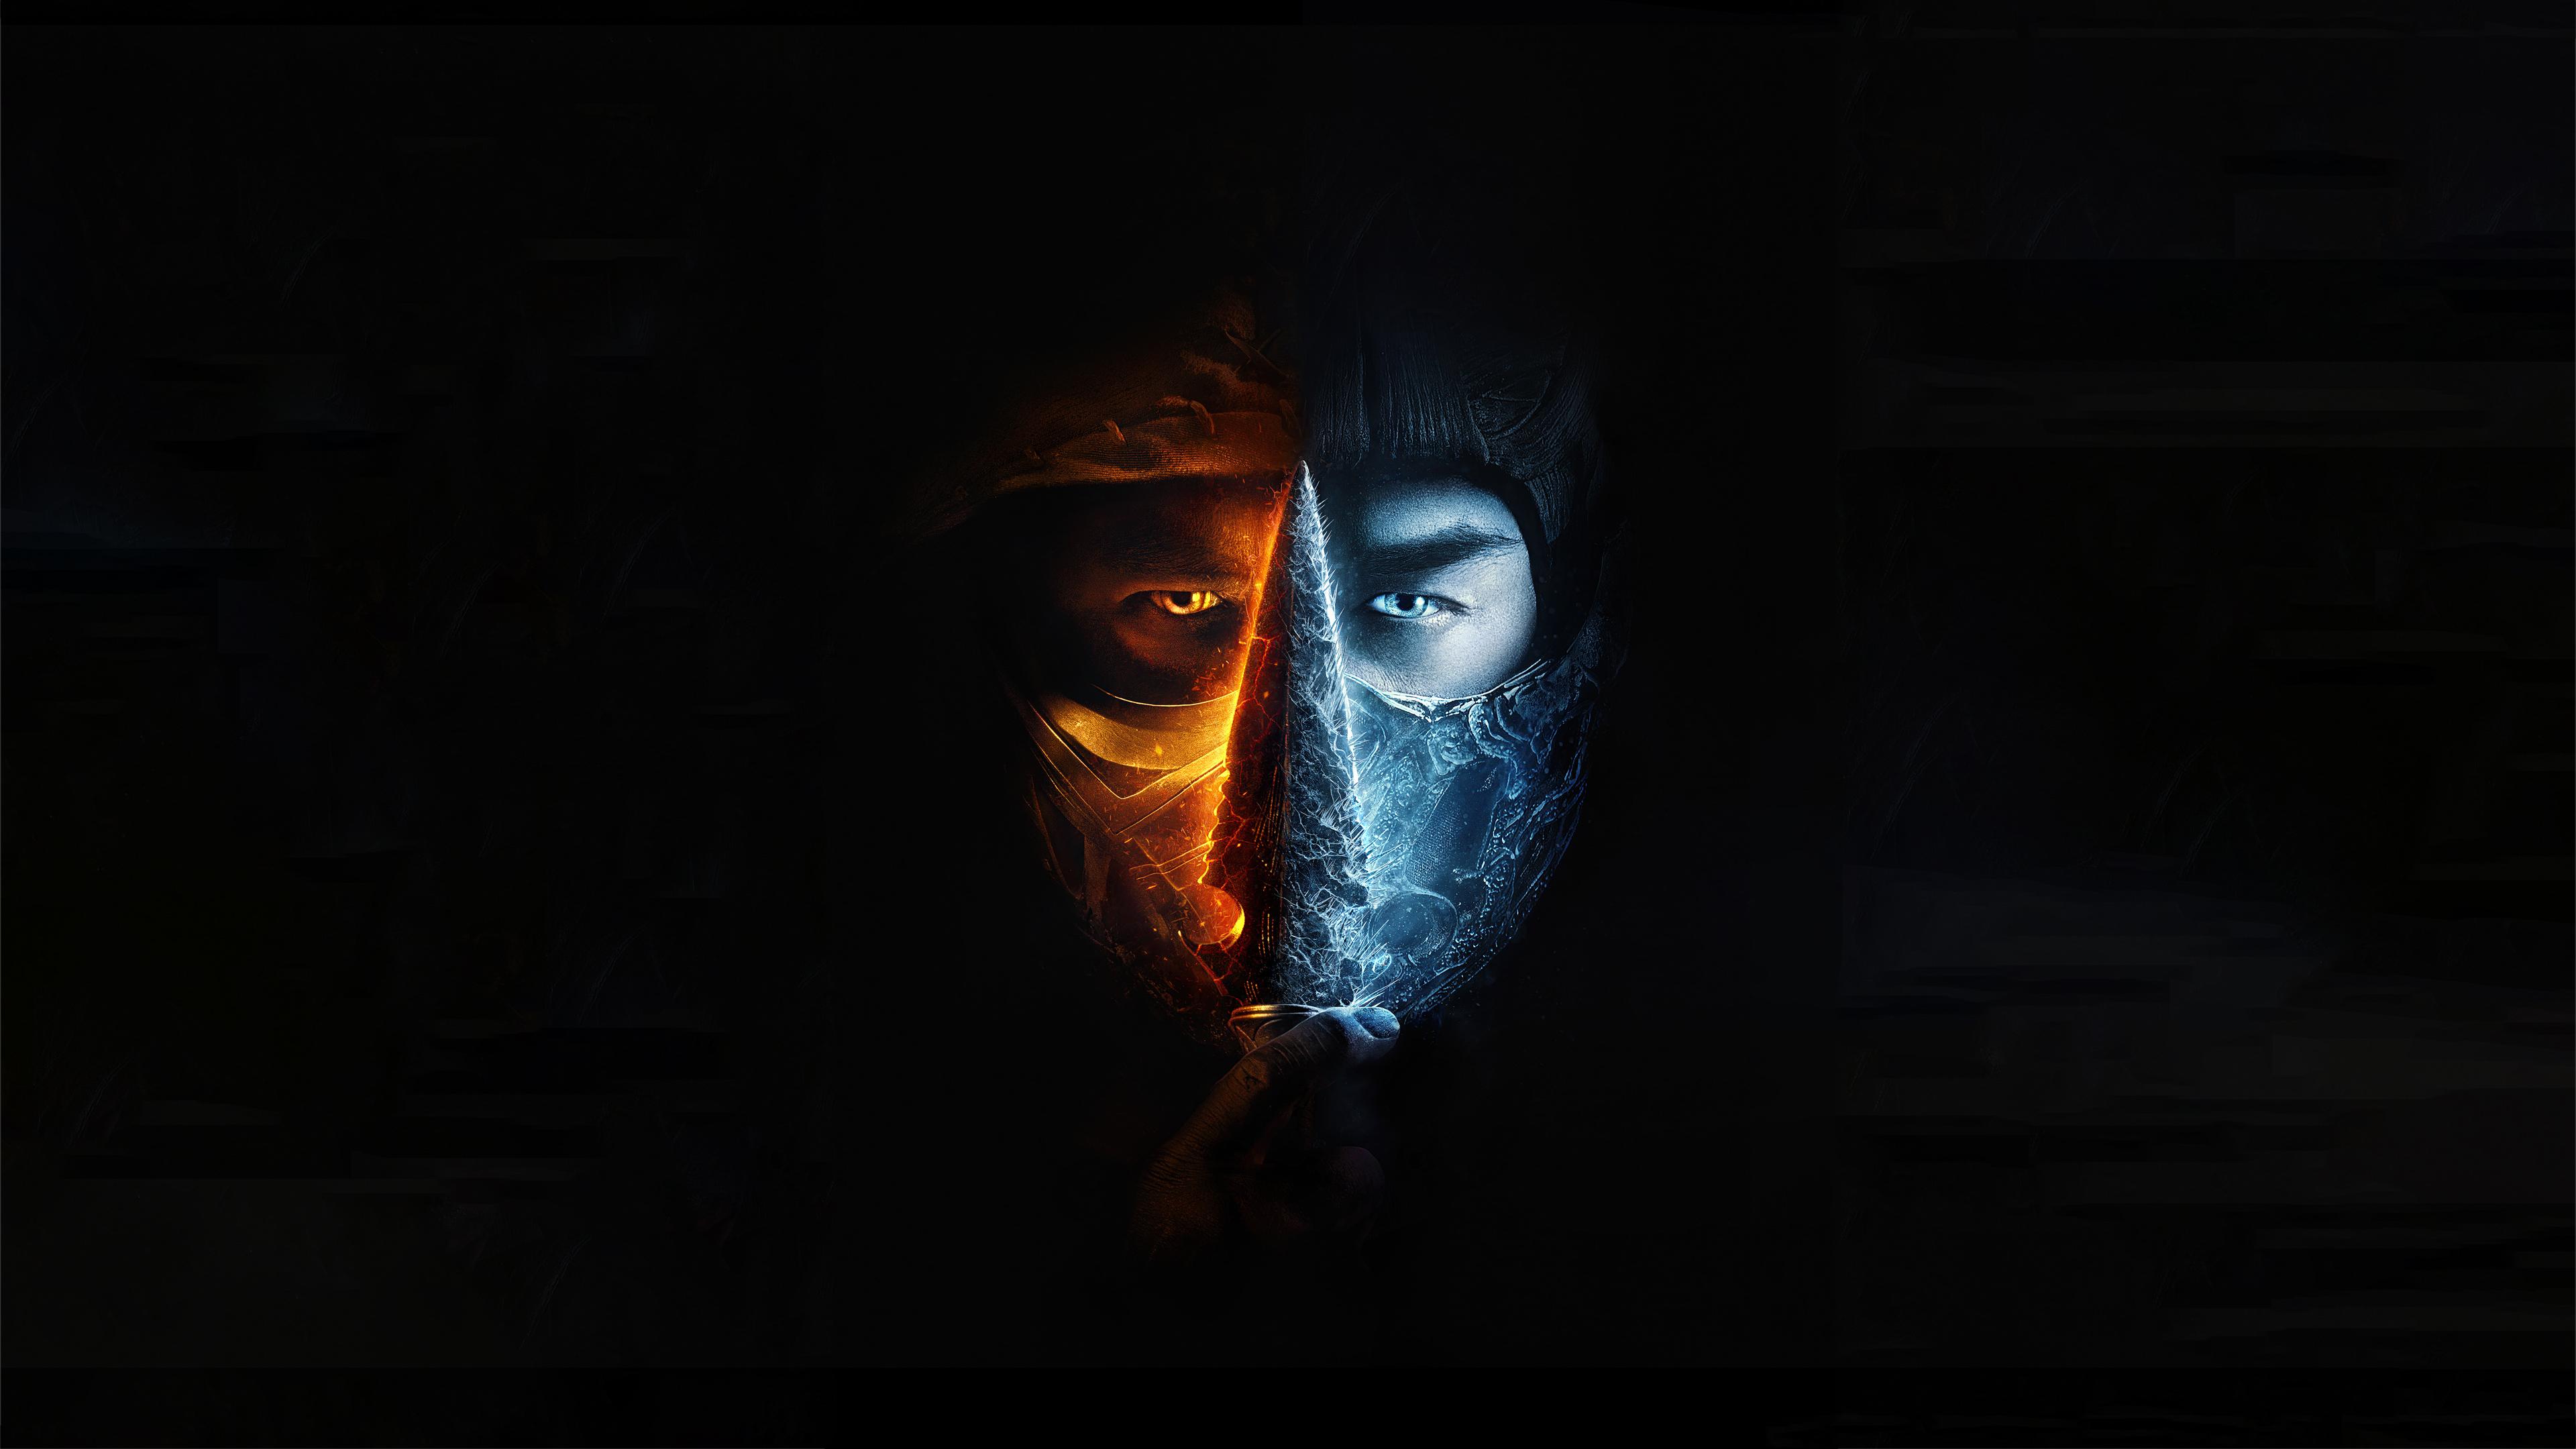 mortal kombat movie logo 4k 1618165474 - Mortal Kombat Movie Logo 4k - Mortal Kombat Movie Logo 4k wallpapers